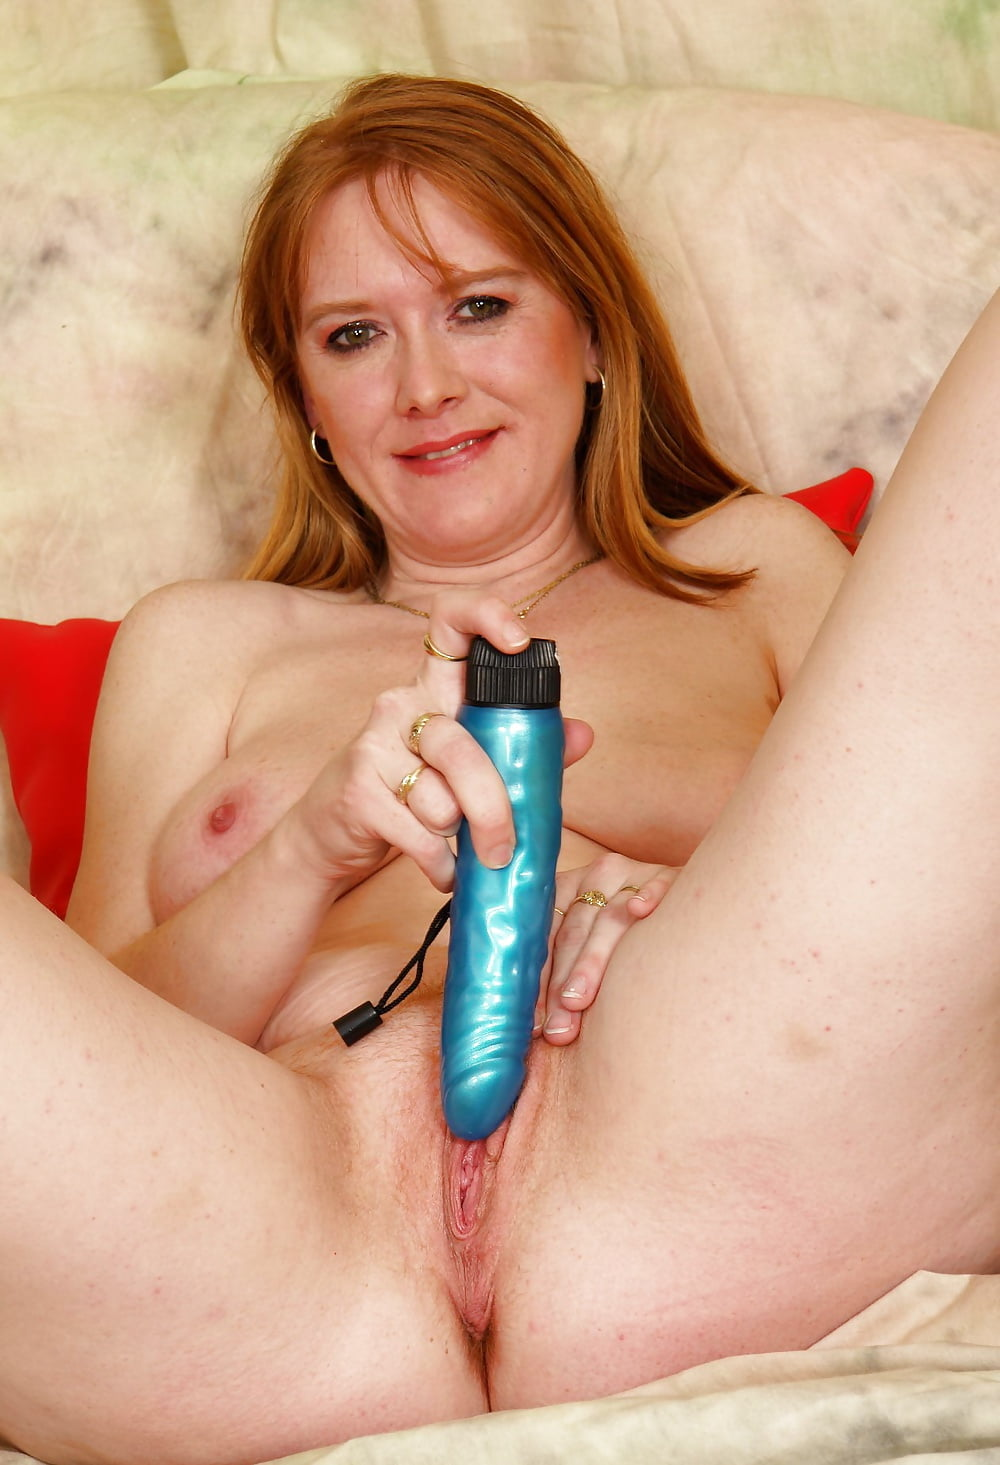 Redhead xhamster